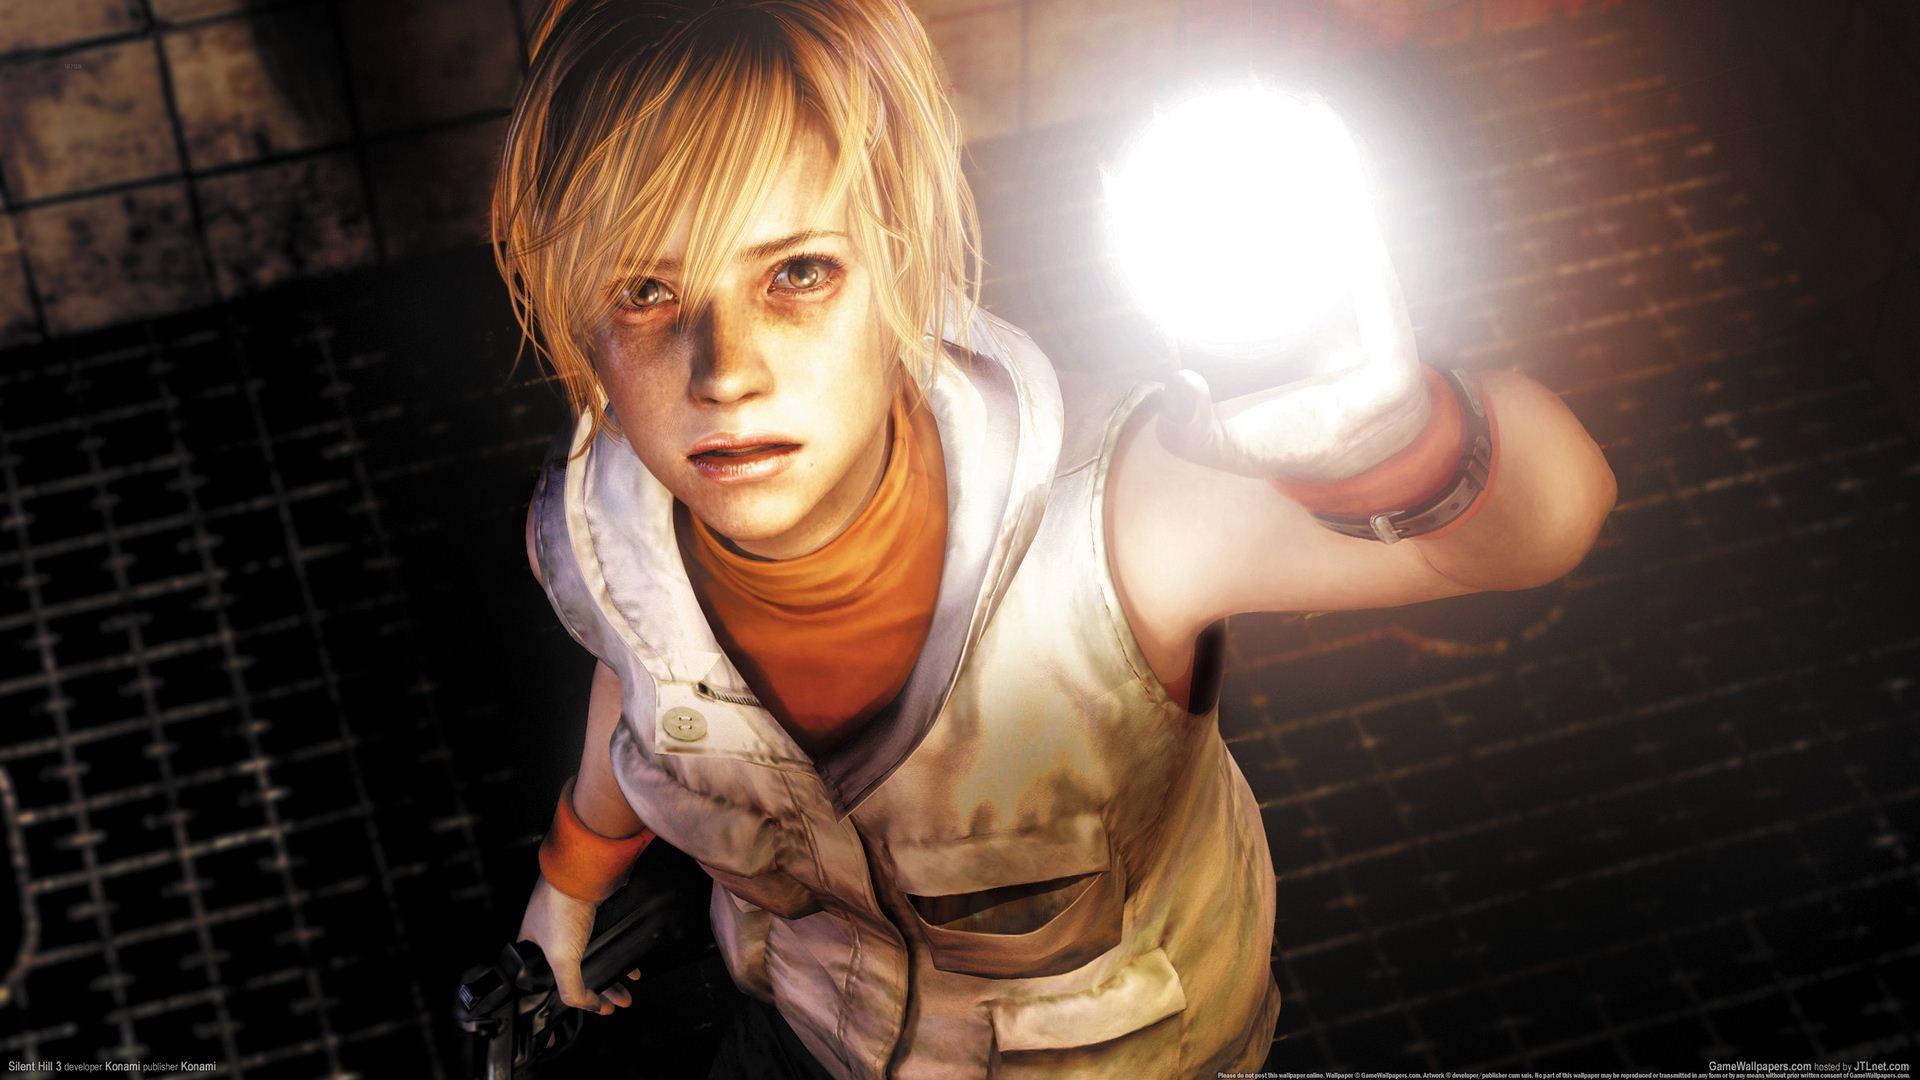 thunder中文歌词